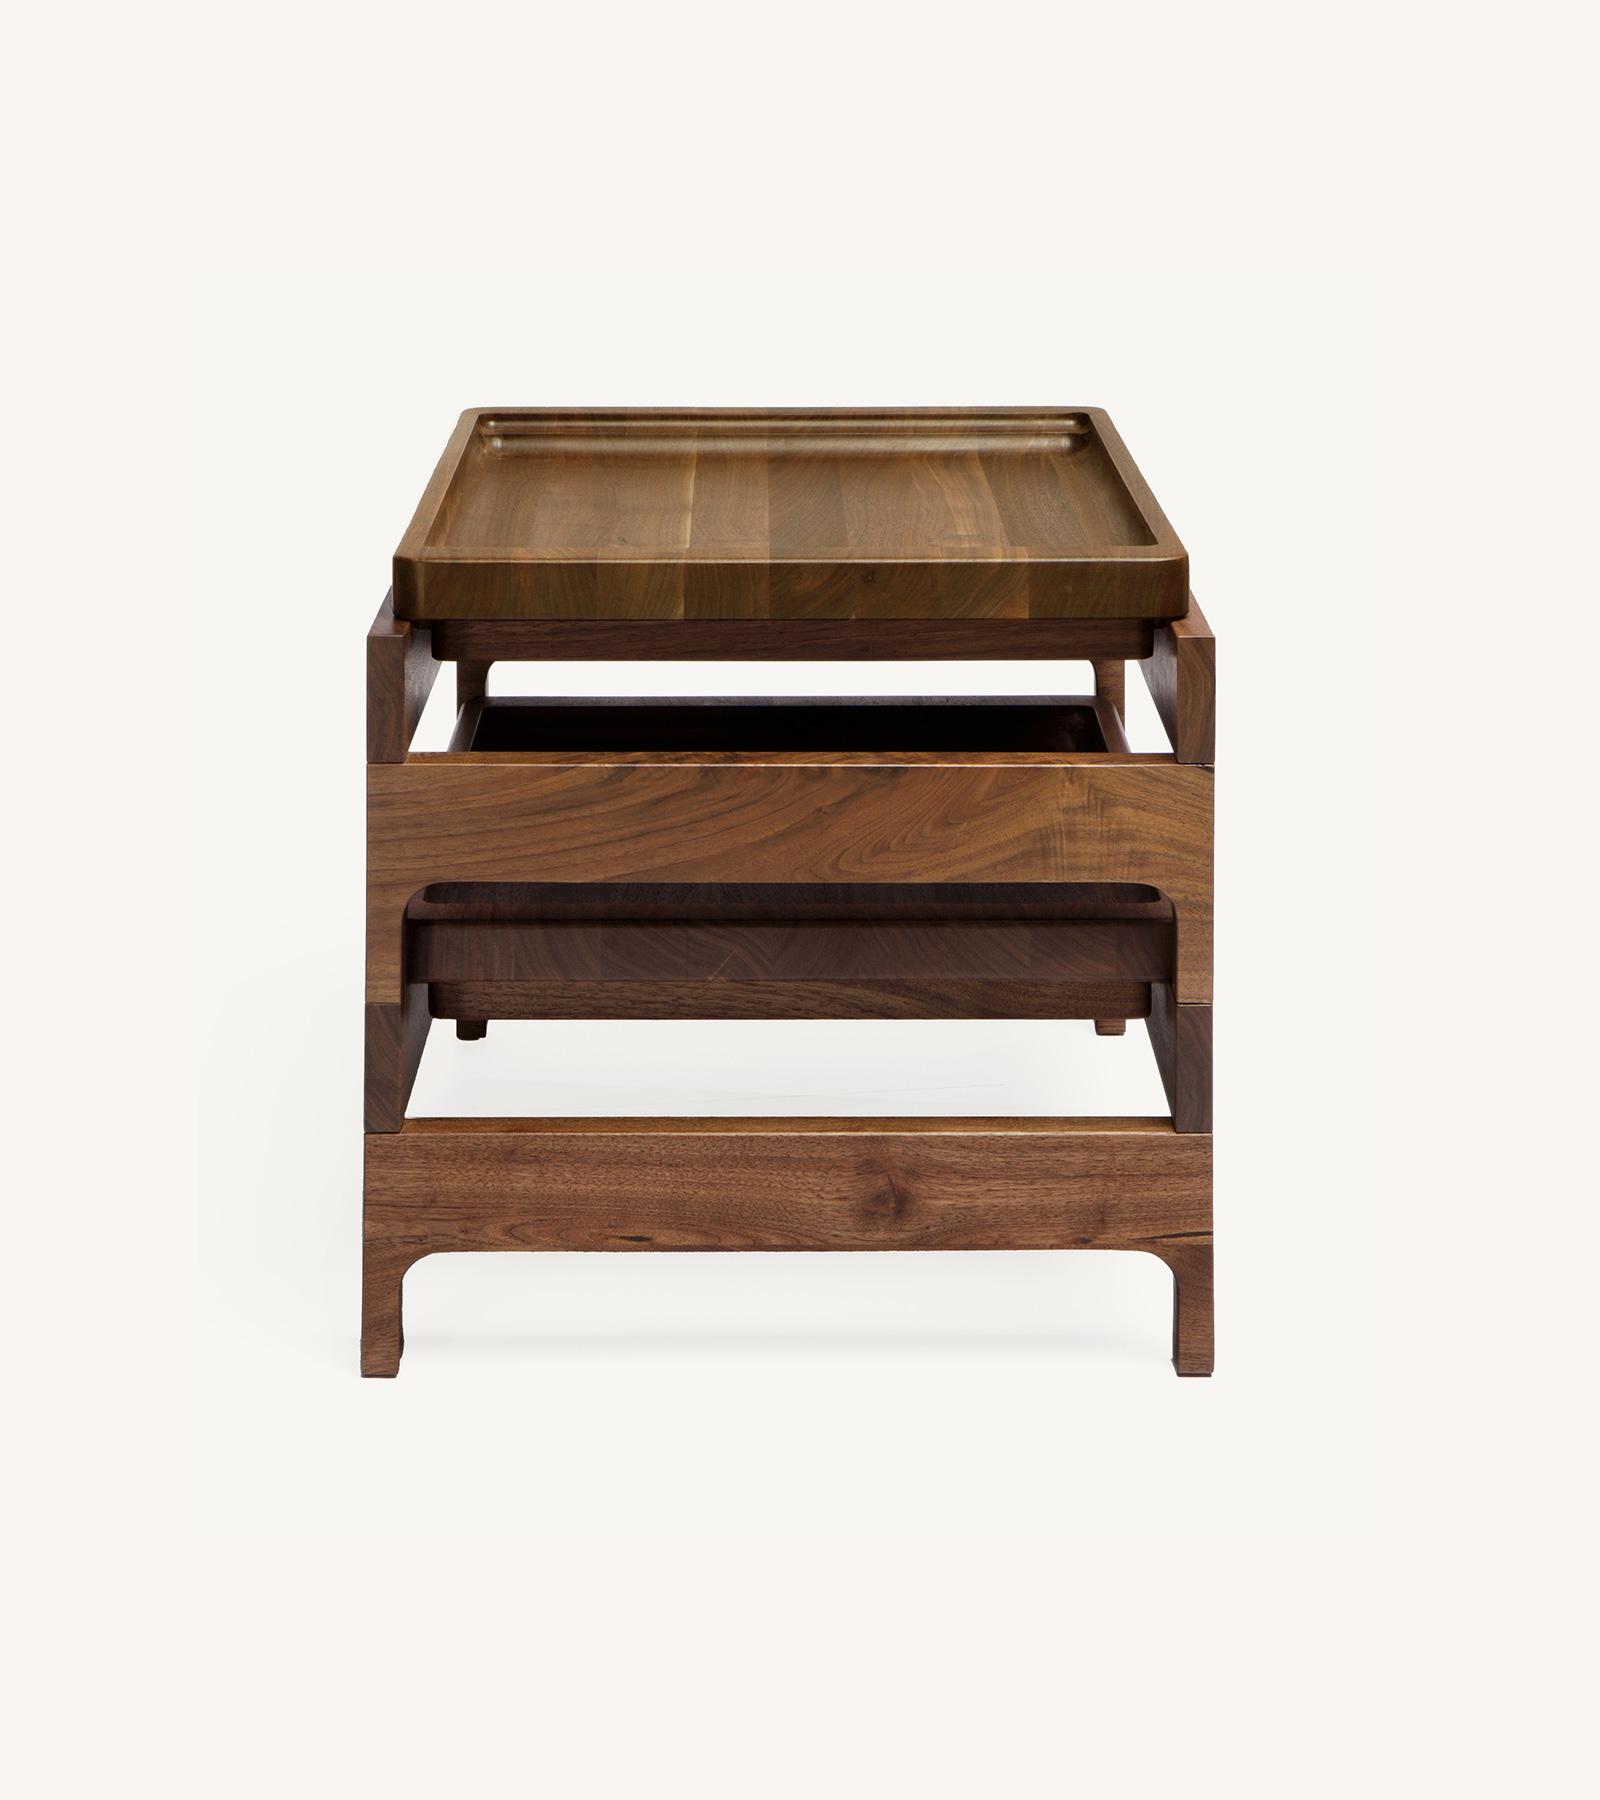 TinnappleMetz-bassamfellows-Tray-Rack-Side-Table-03